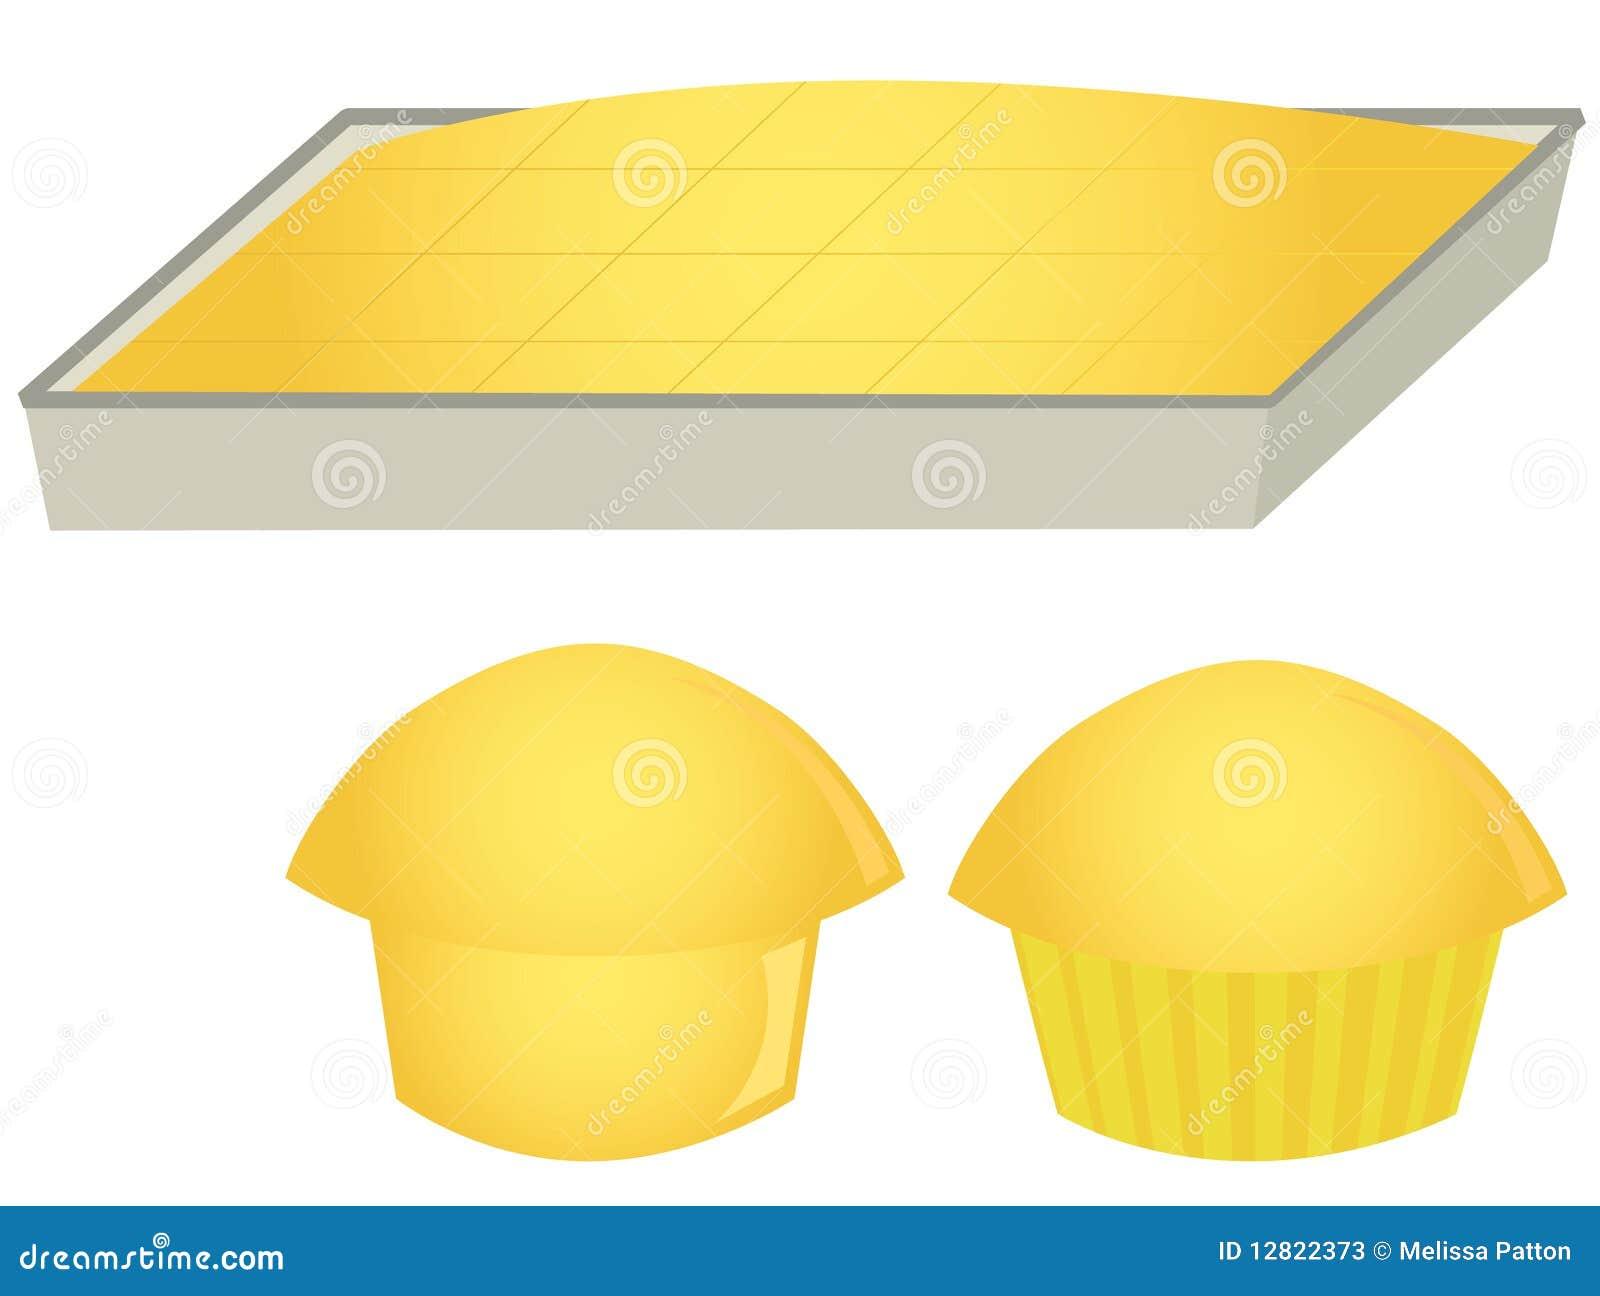 cornbread cartoons  illustrations  u0026 vector stock images